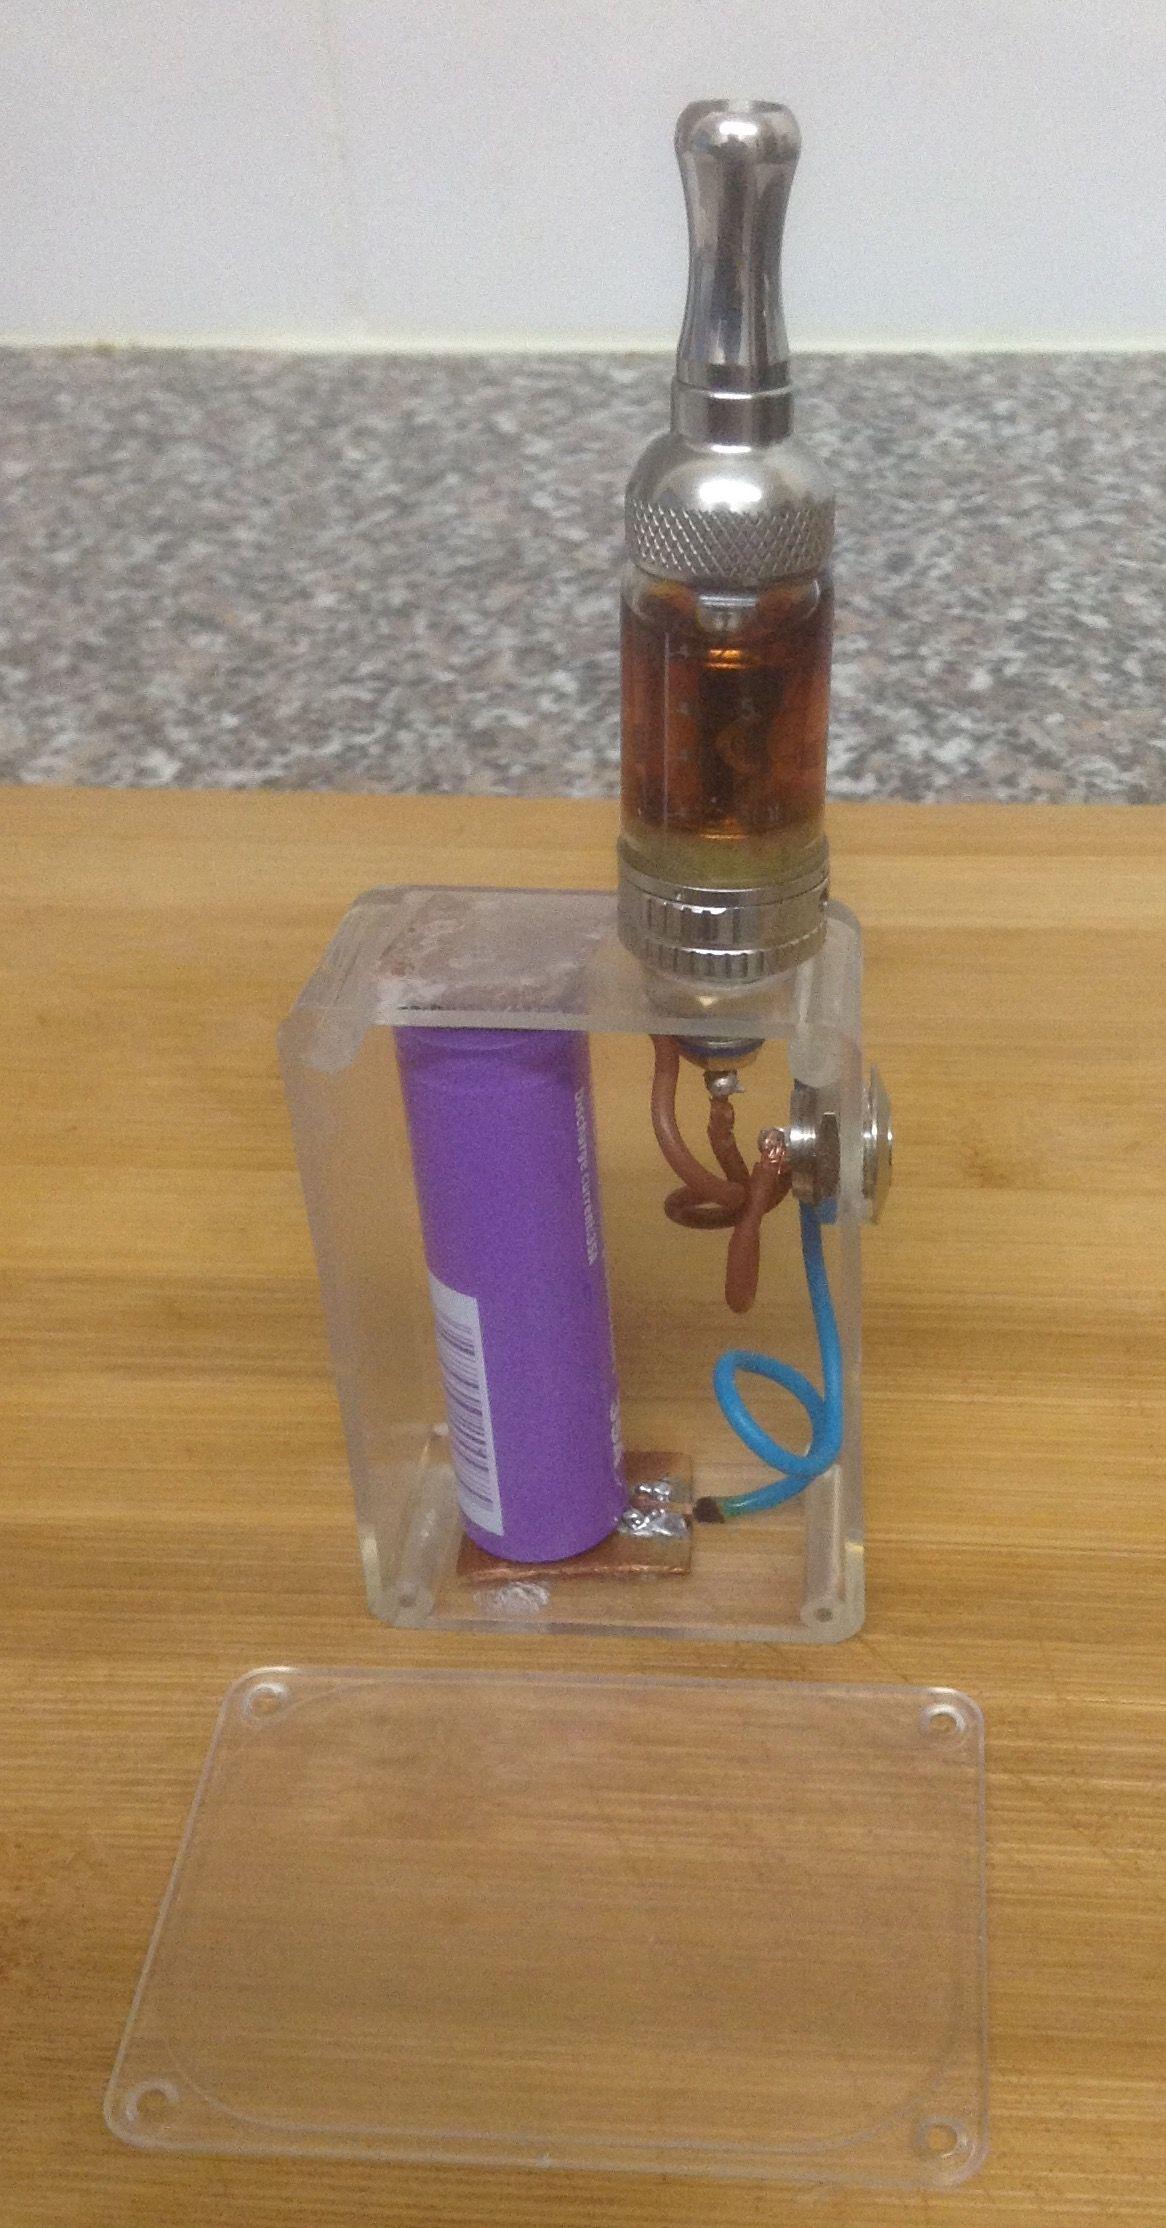 Homemade, unregulated, single 18650 box mod, made with